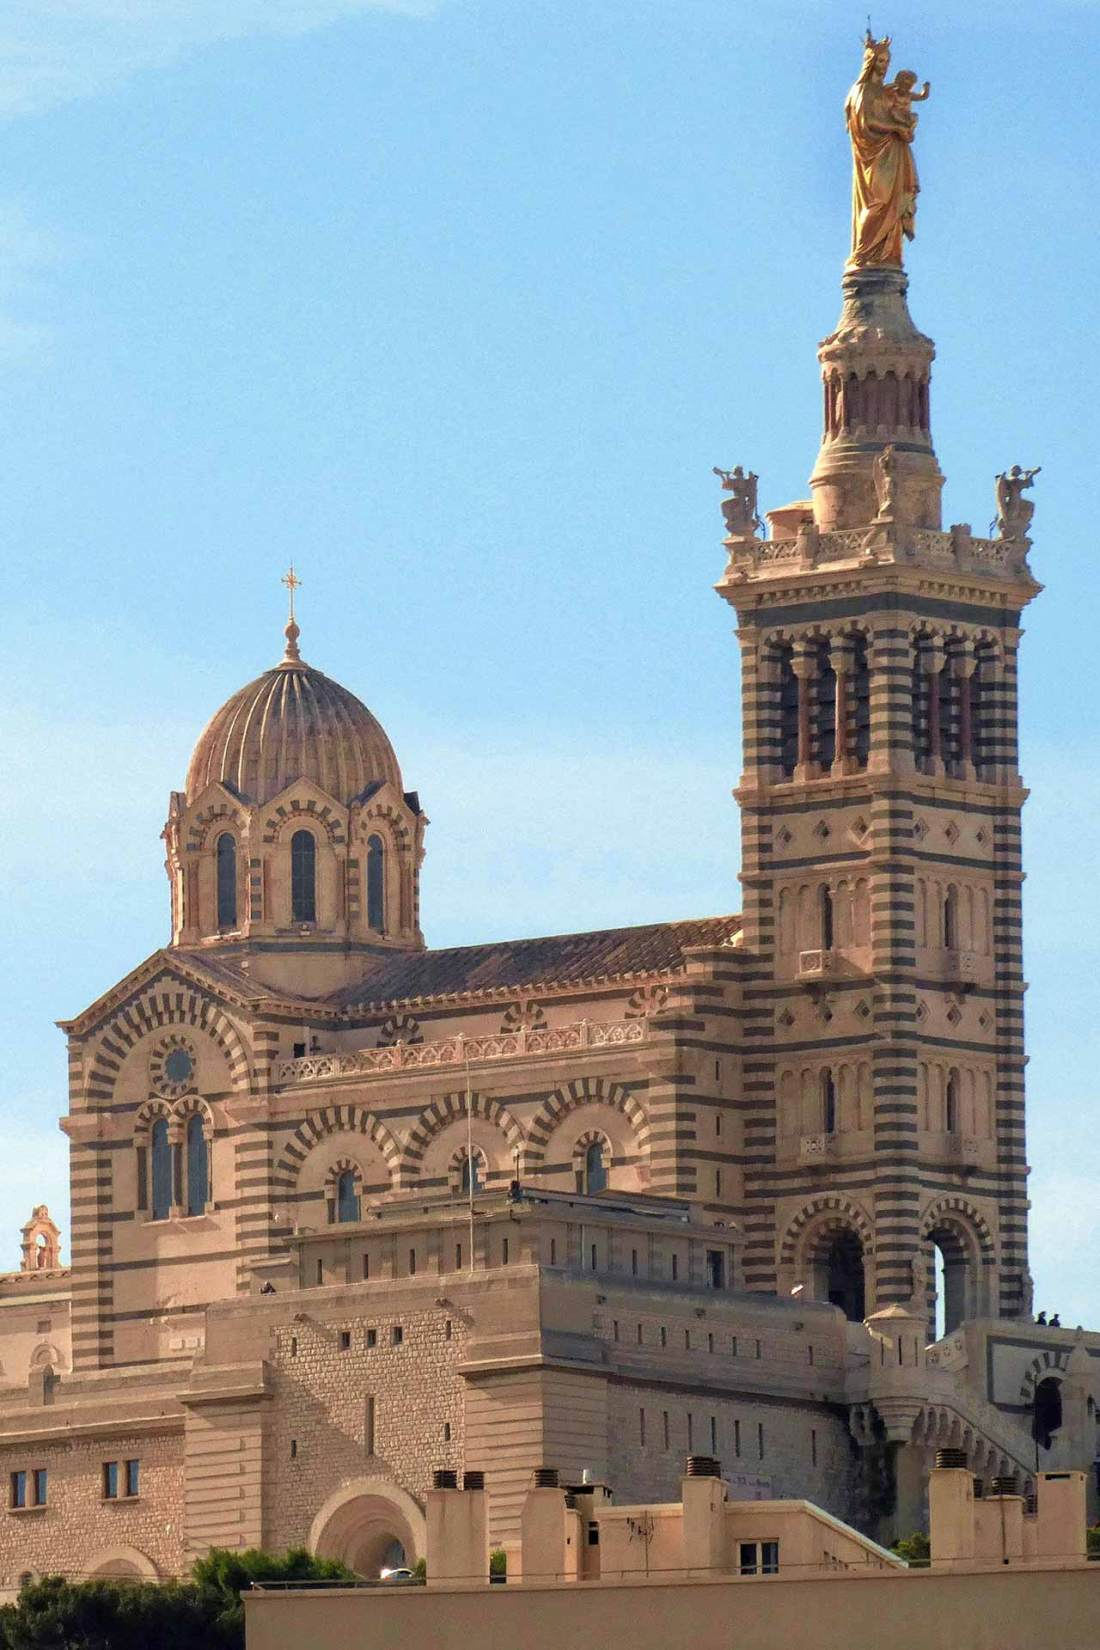 Mareseille - Notre-Dame de la Garde